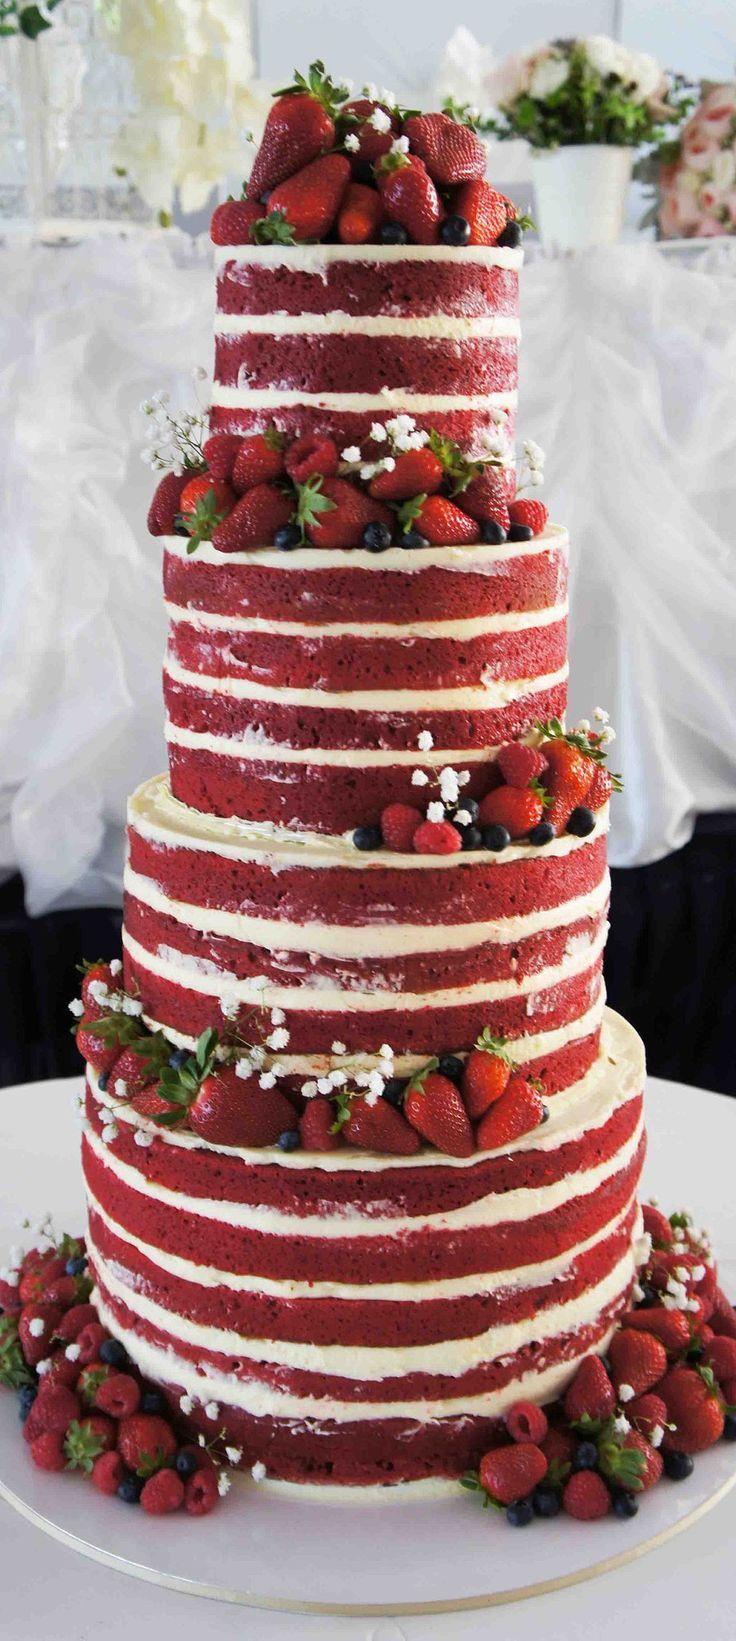 Wedding decorations red  Pin by nimrodmangwale on malwela  Pinterest  Red velvet Wedding